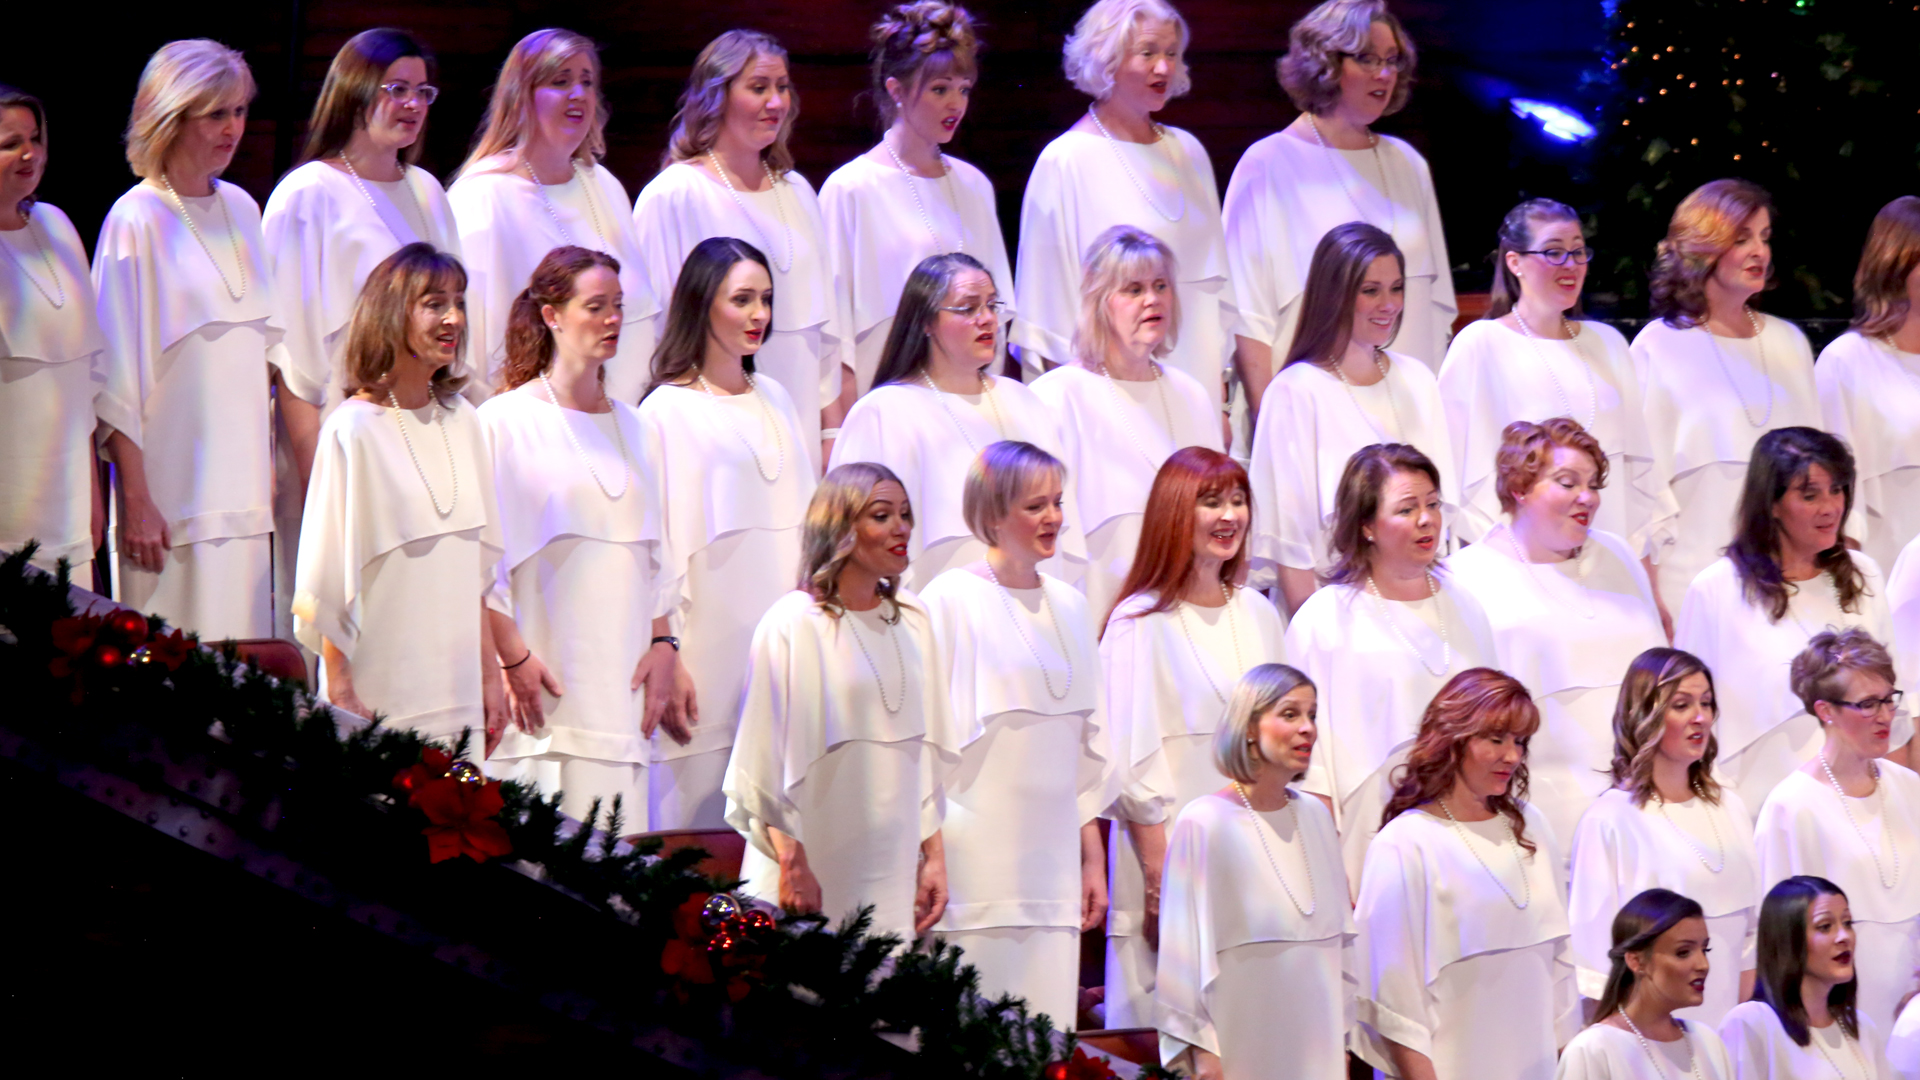 Mormon Tabernacle Choir Christmas 2020-Pbs Mormon Tabernacle Christmas Concert 2020 Pbs | Mdxmky